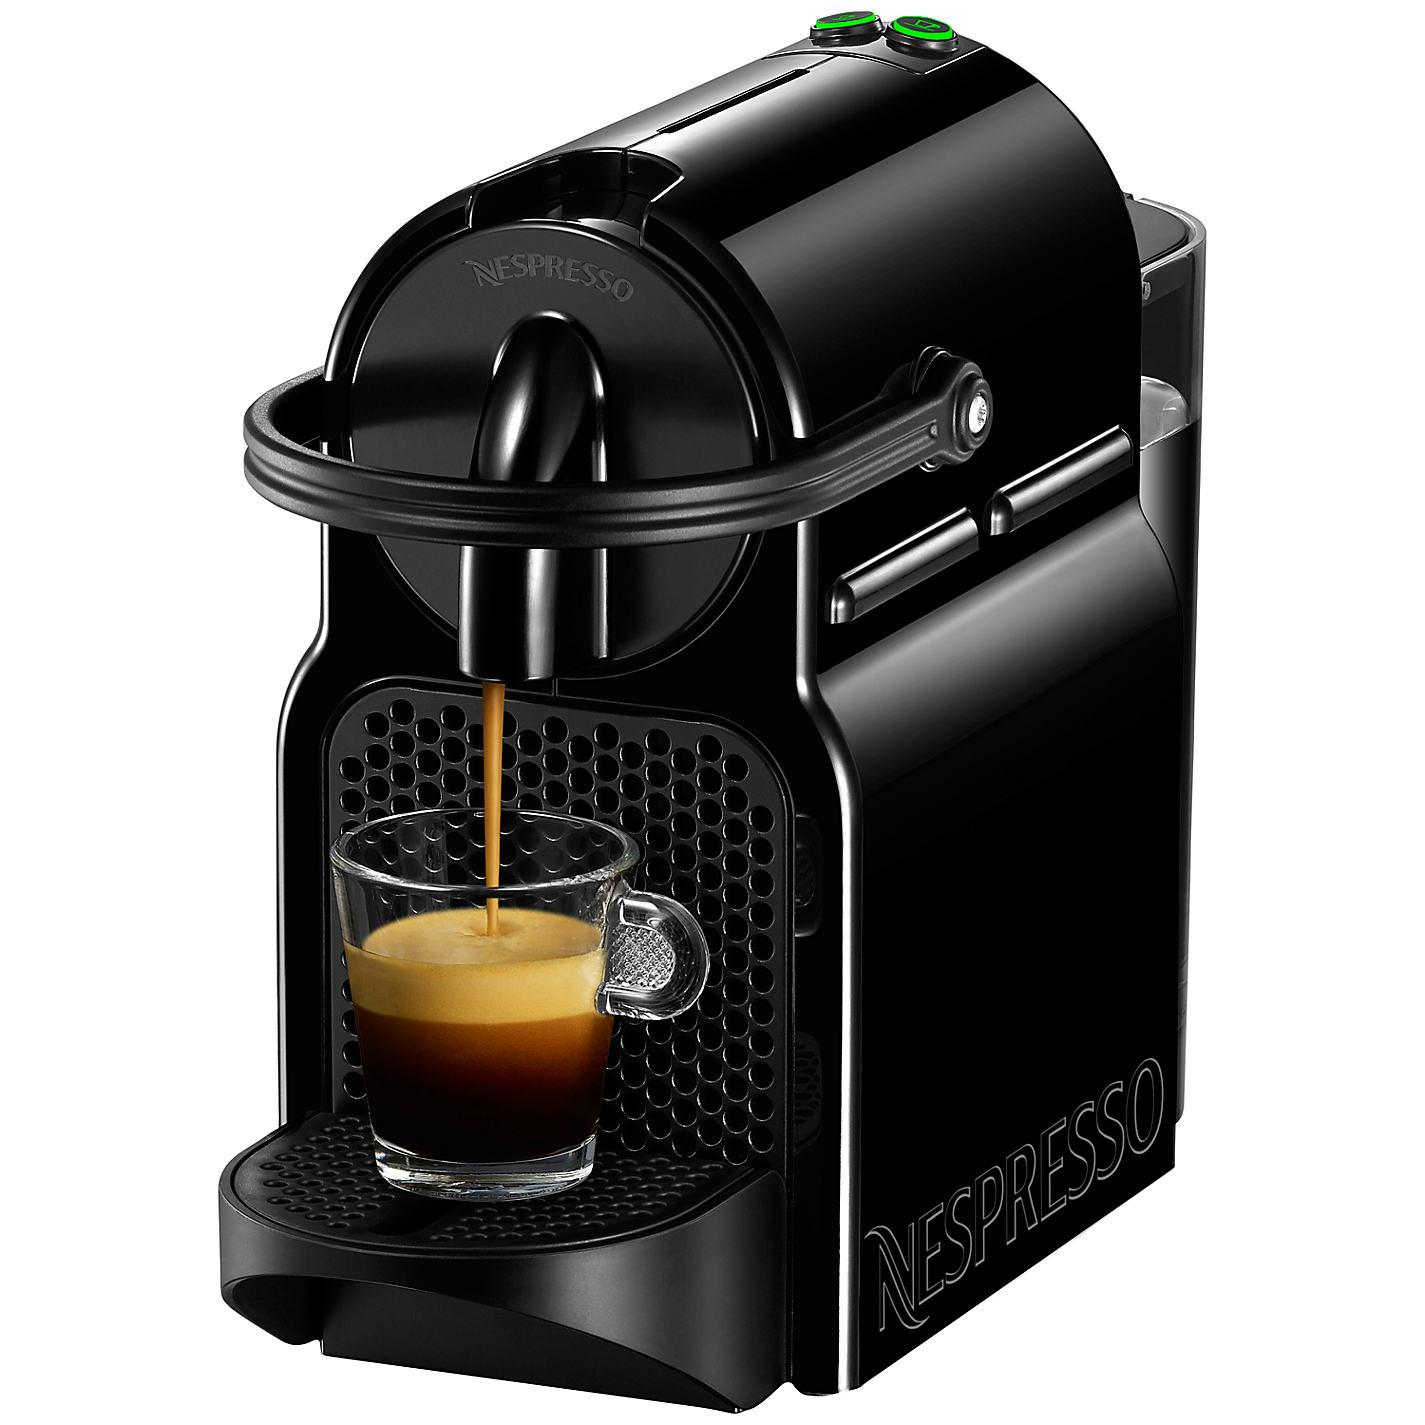 Nespresso Inissia Coffee Machine Black/Cream £49 @ John Lewis